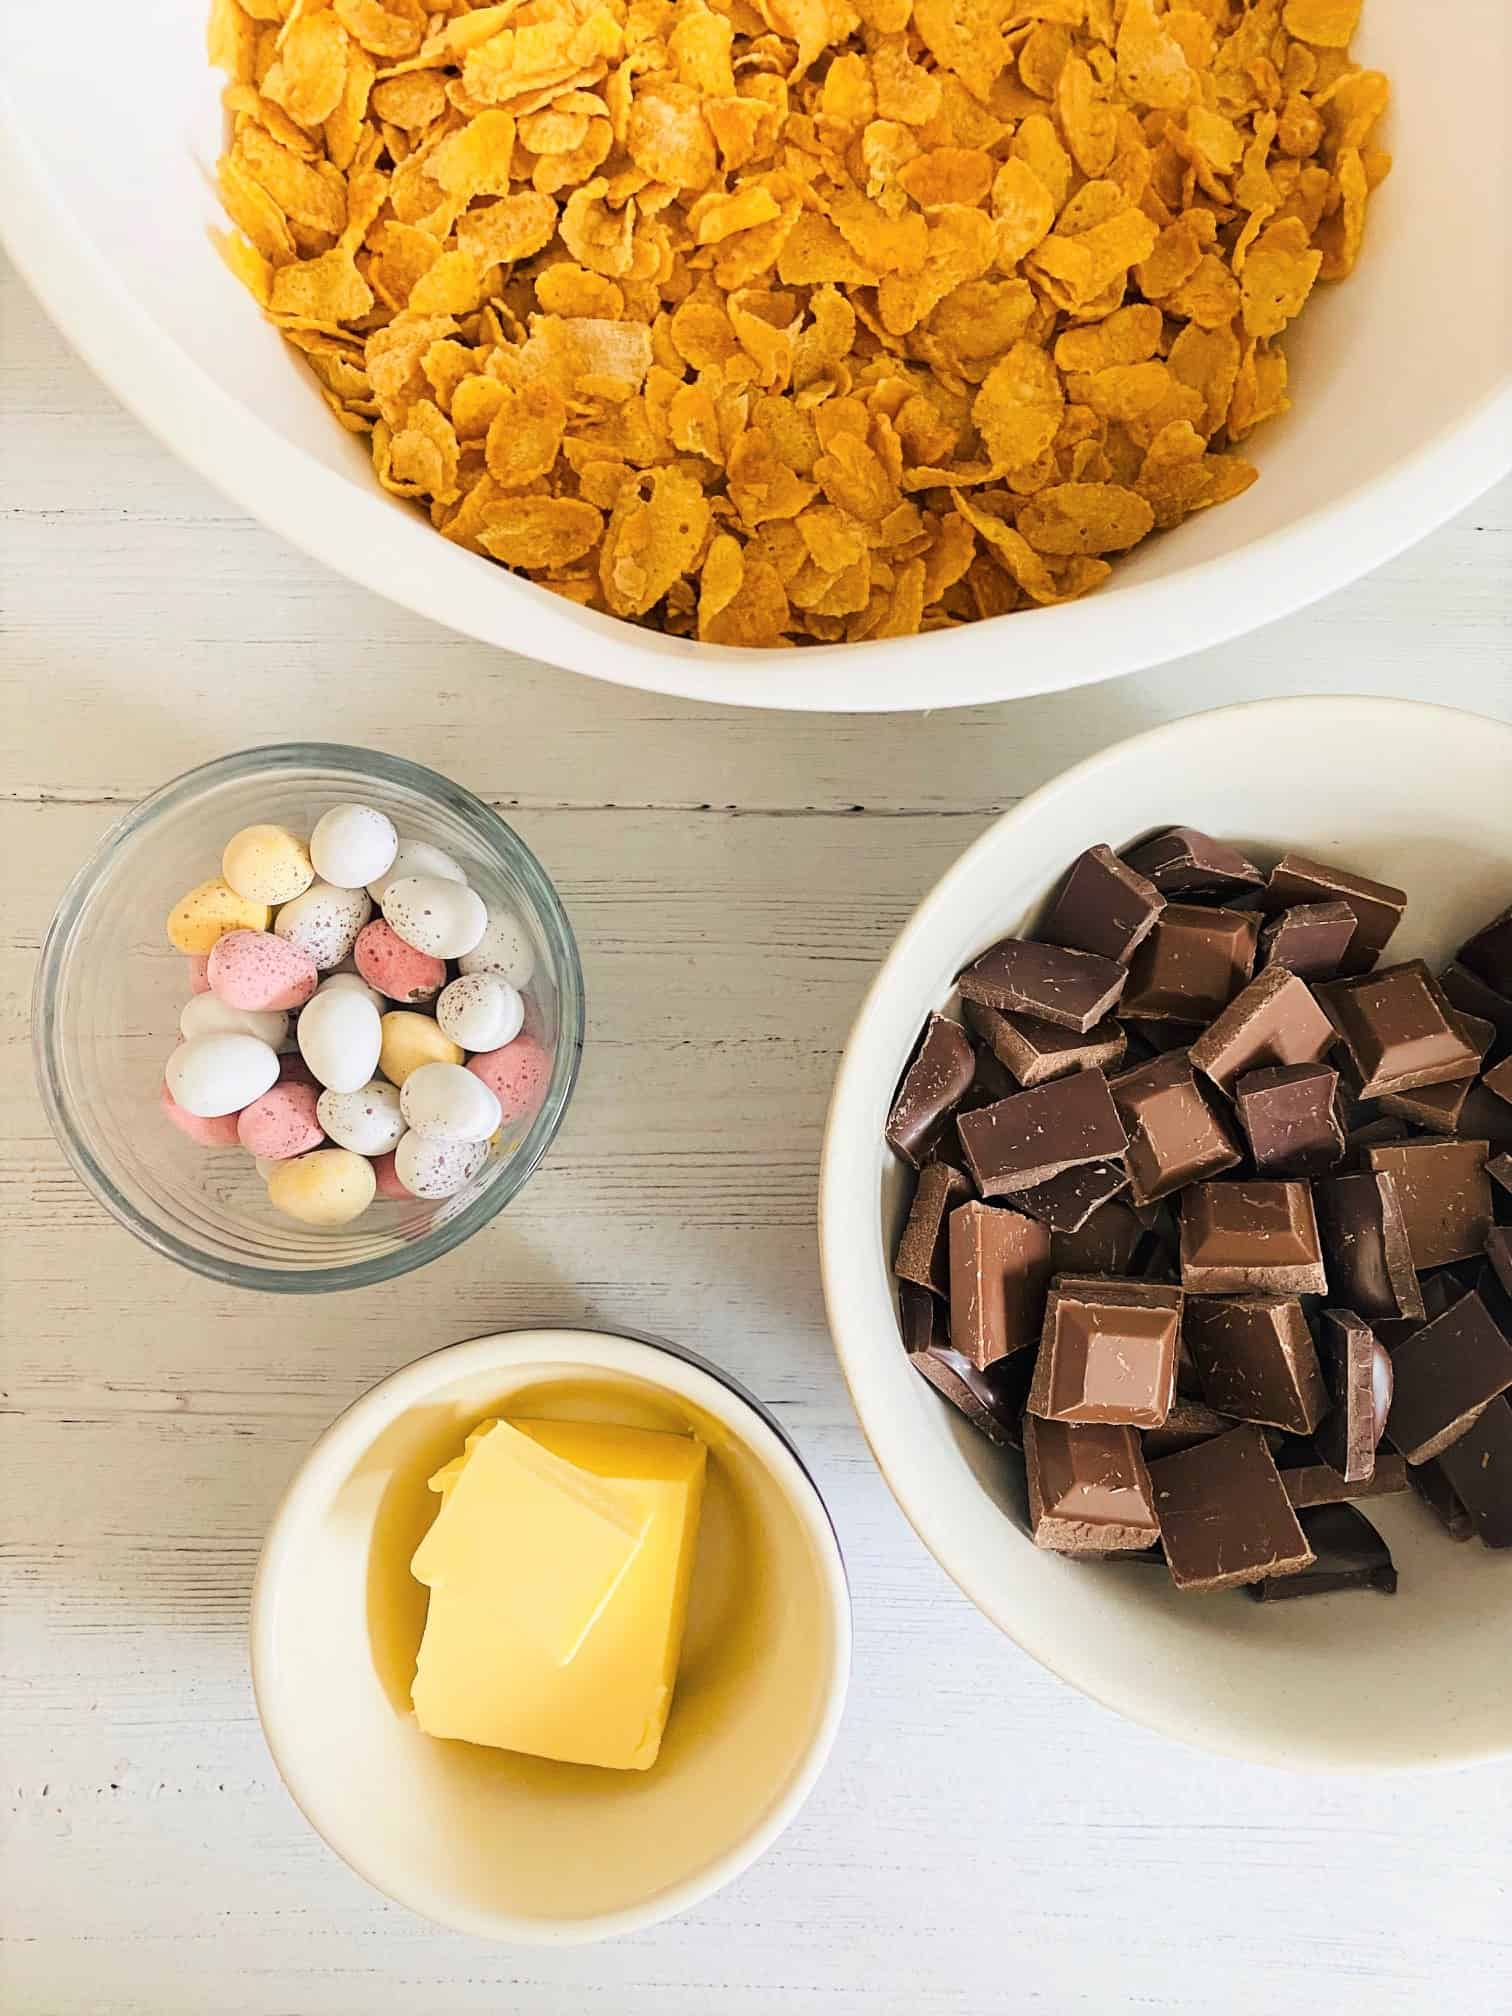 ingredients for chocolate cornflake cake